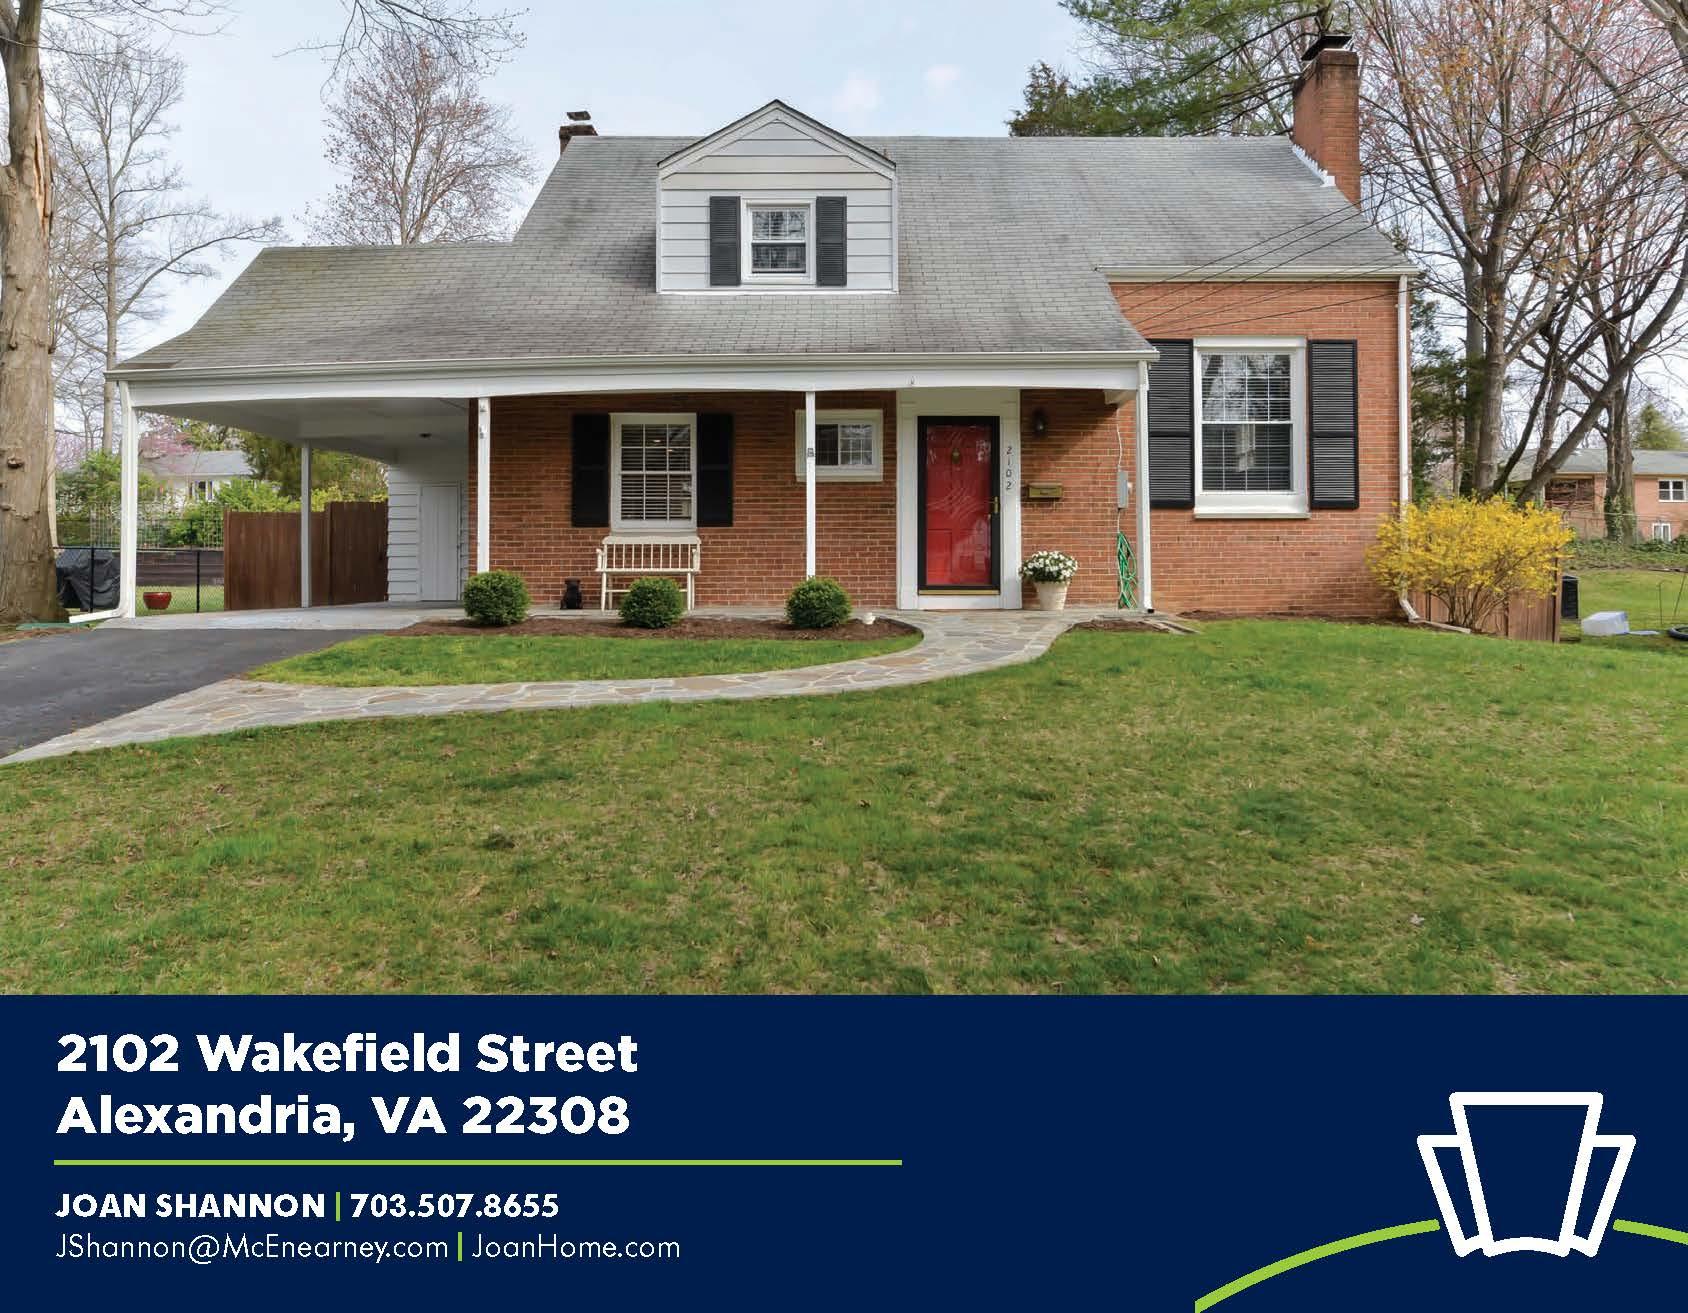 wakefield street front_Page_1.jpg